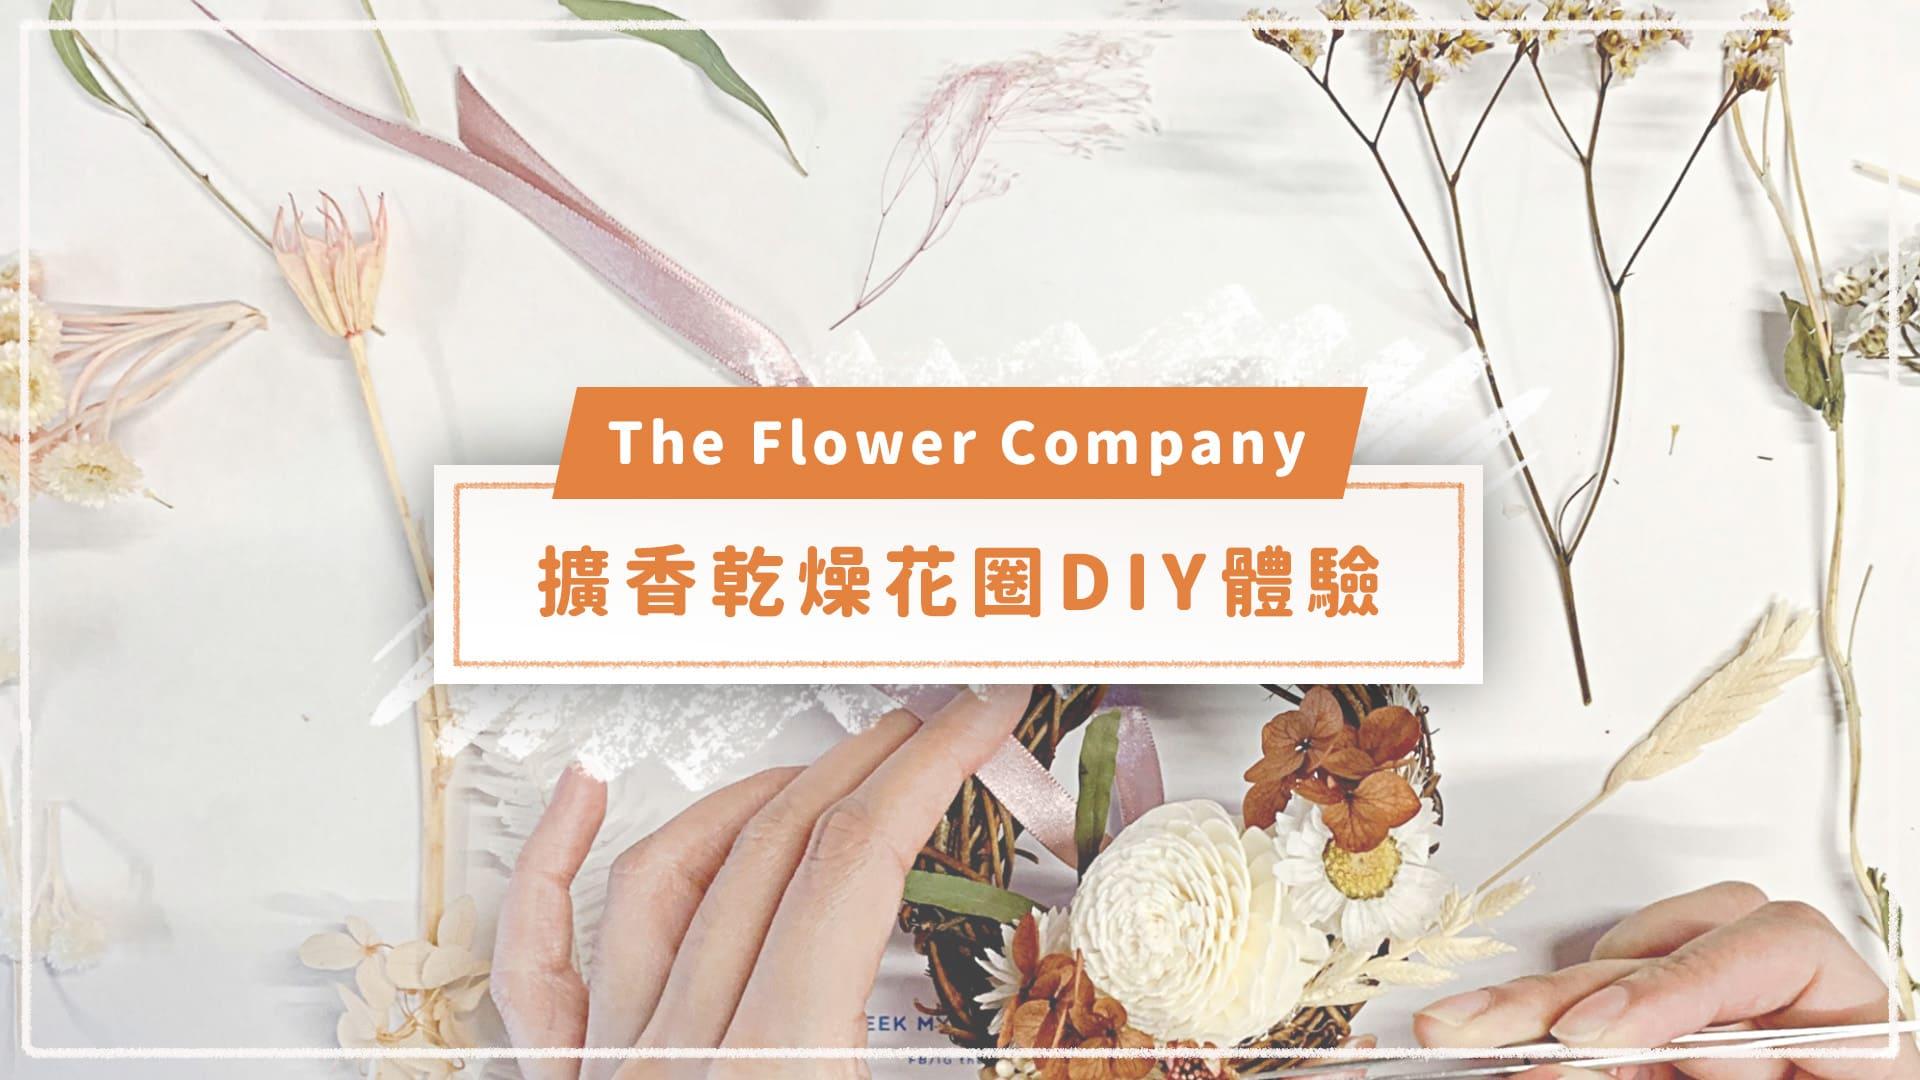 The Flower Company 手作開箱:DIY 擴香乾燥花圈體驗